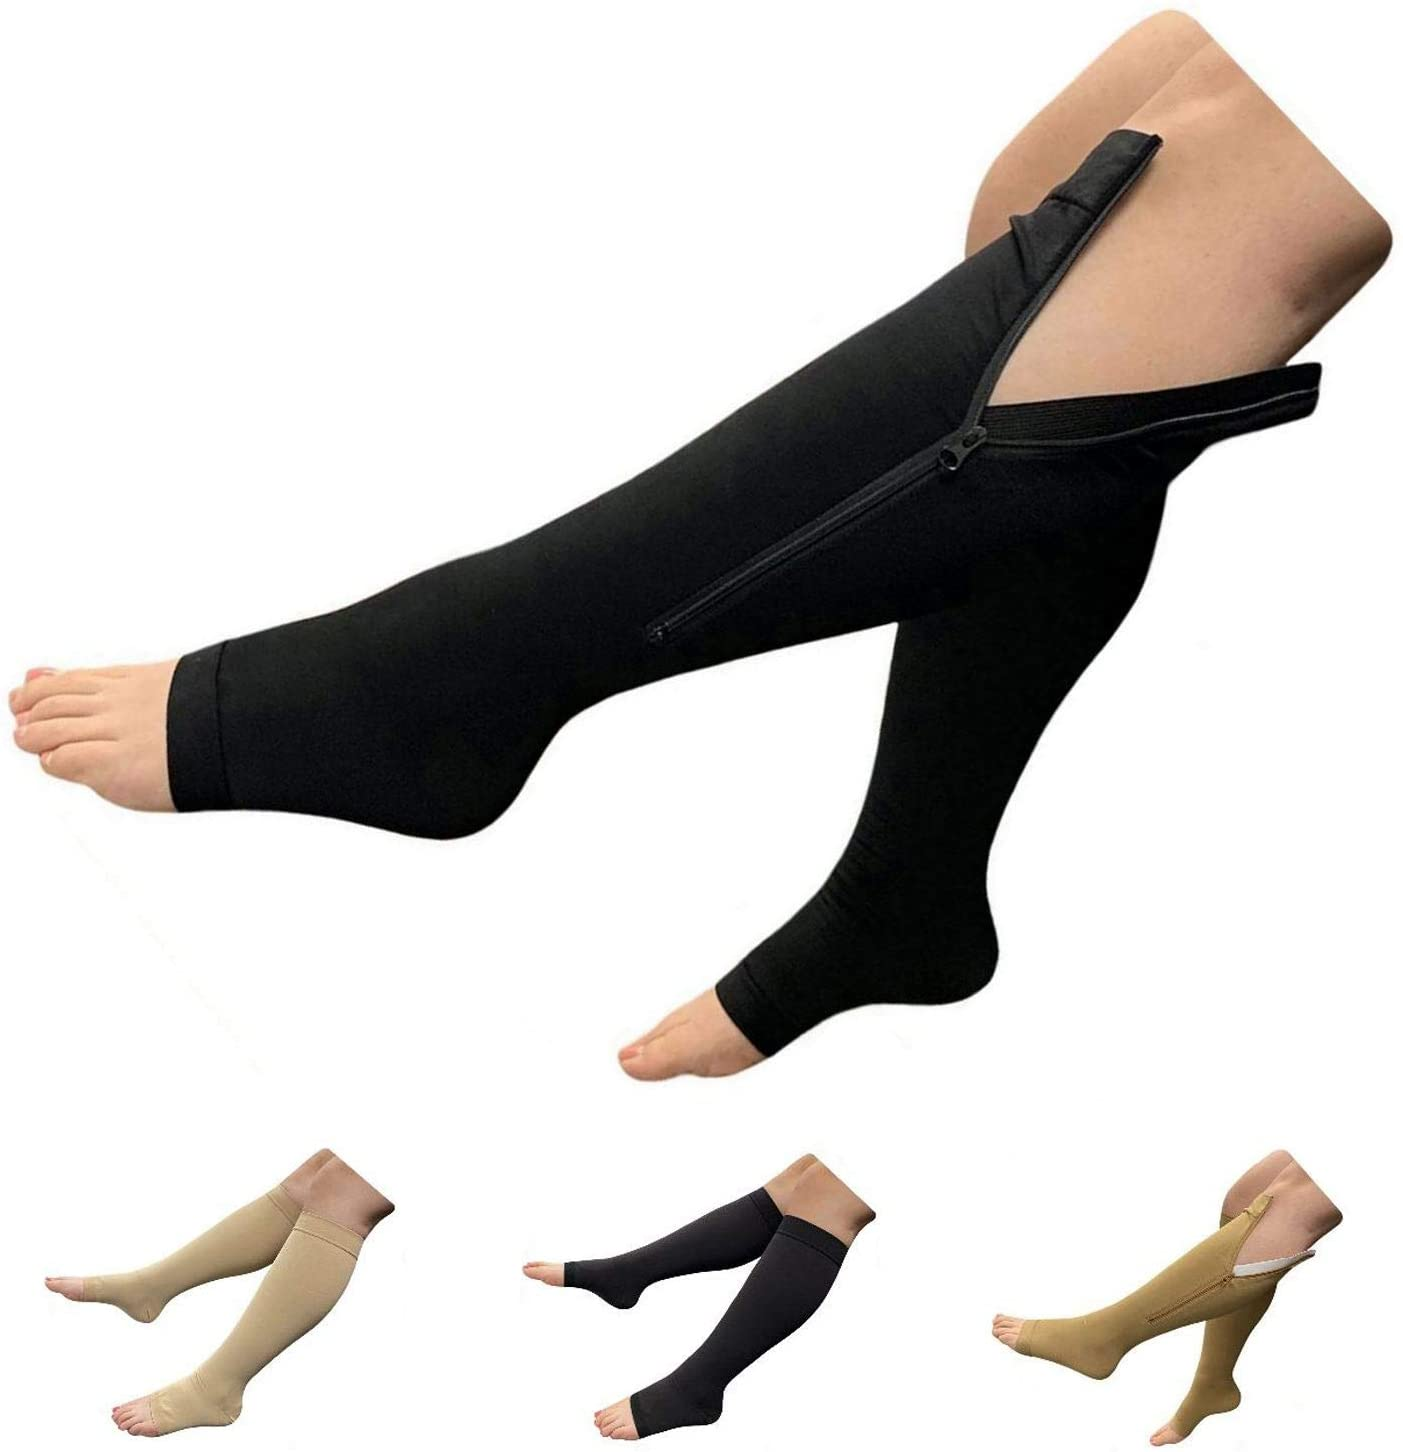 HealthyNees Big Tall Open Toe 20-30 mmHg Compression Plus Wide Calf Leg Socks (Black with Zipper, 2X-Large)